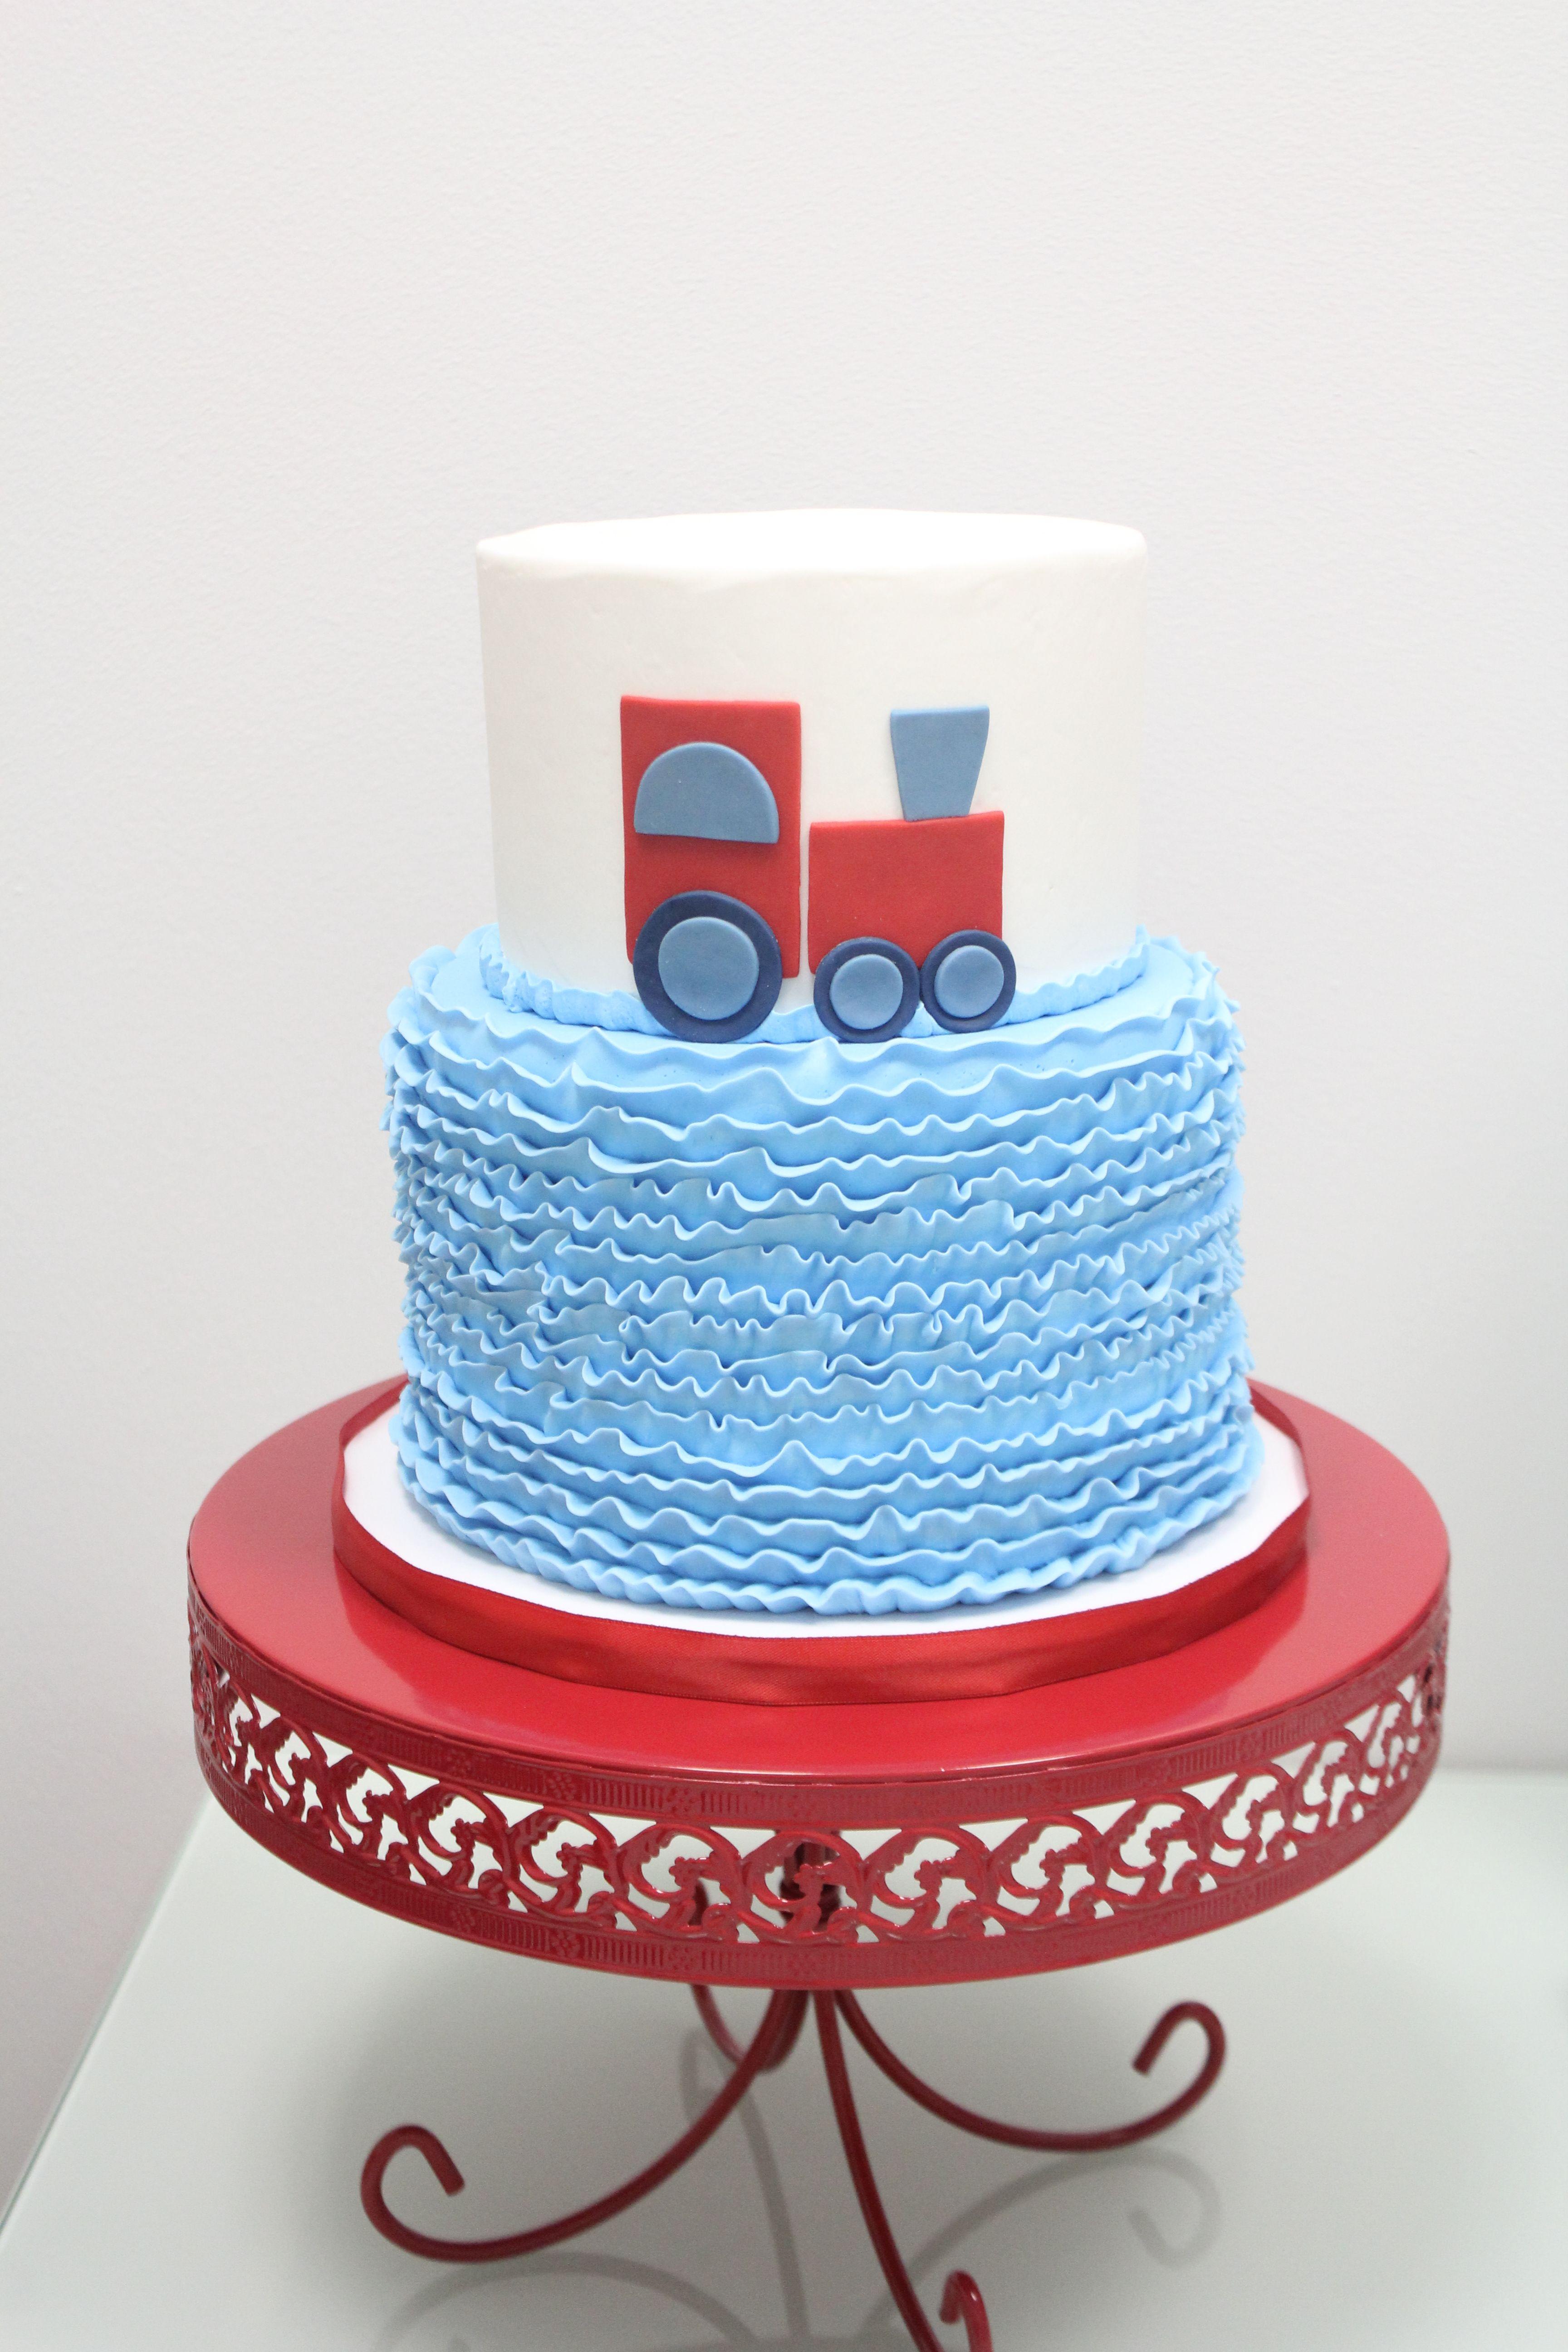 Train Cake With Blue Ruffles